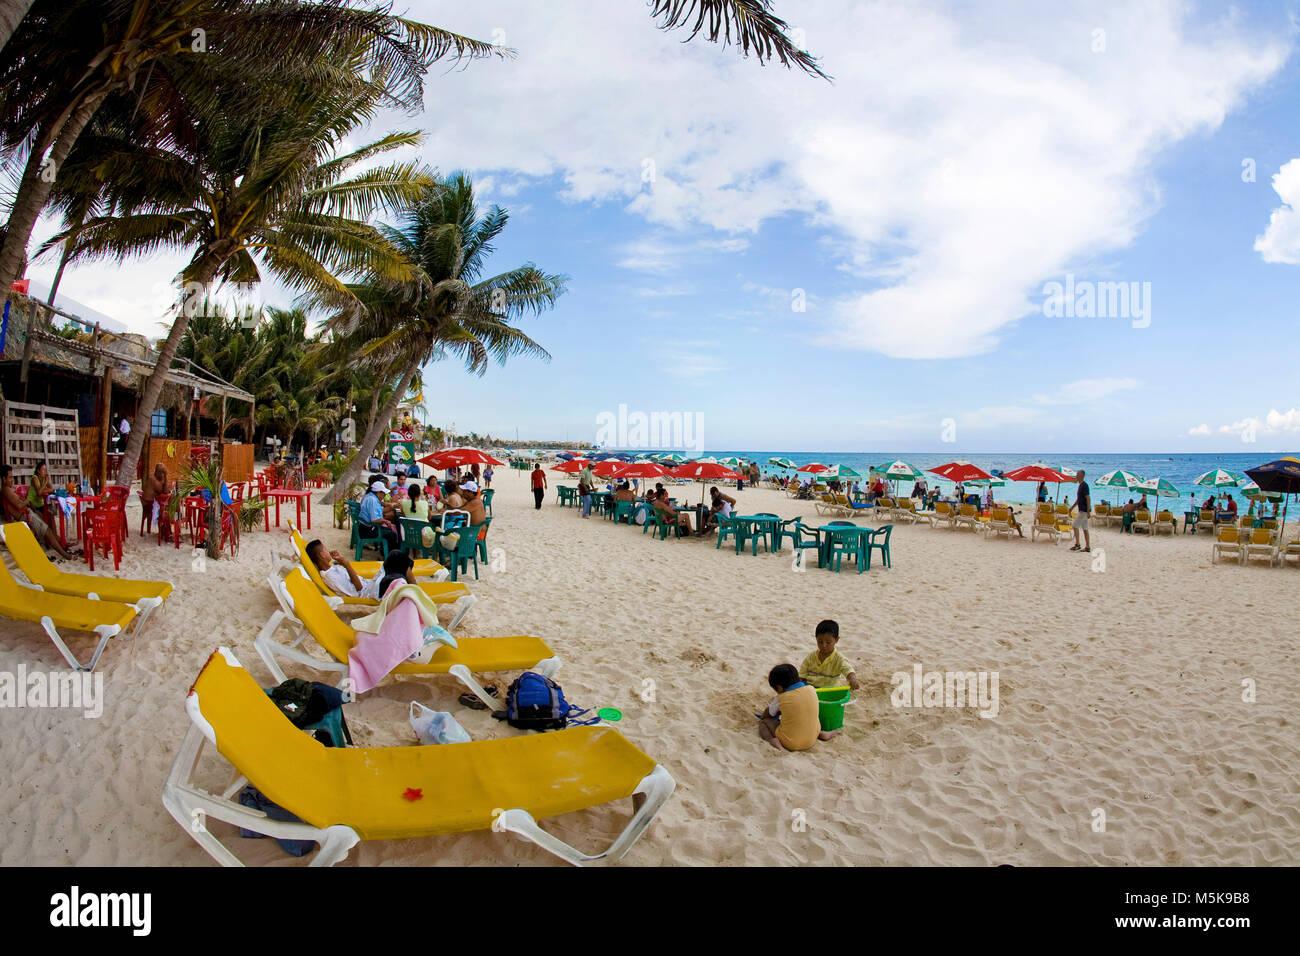 Touristen am Strand von Playa del Carmen, Mexiko, Karibik | Touristen am Strand von Playa del Carmen, Mexiko, Karibik Stockbild